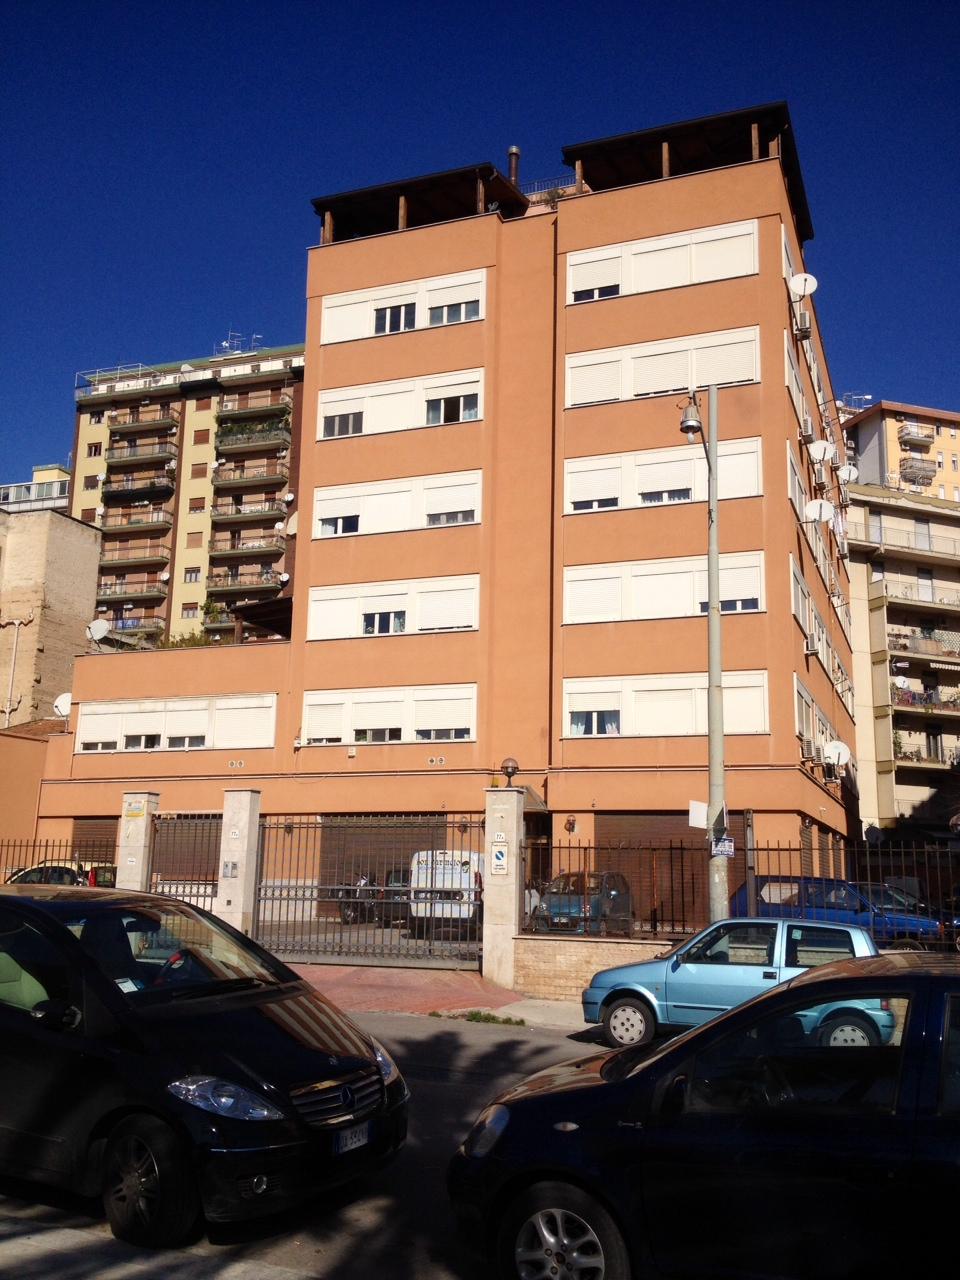 Palermo Affitti Appartamenti